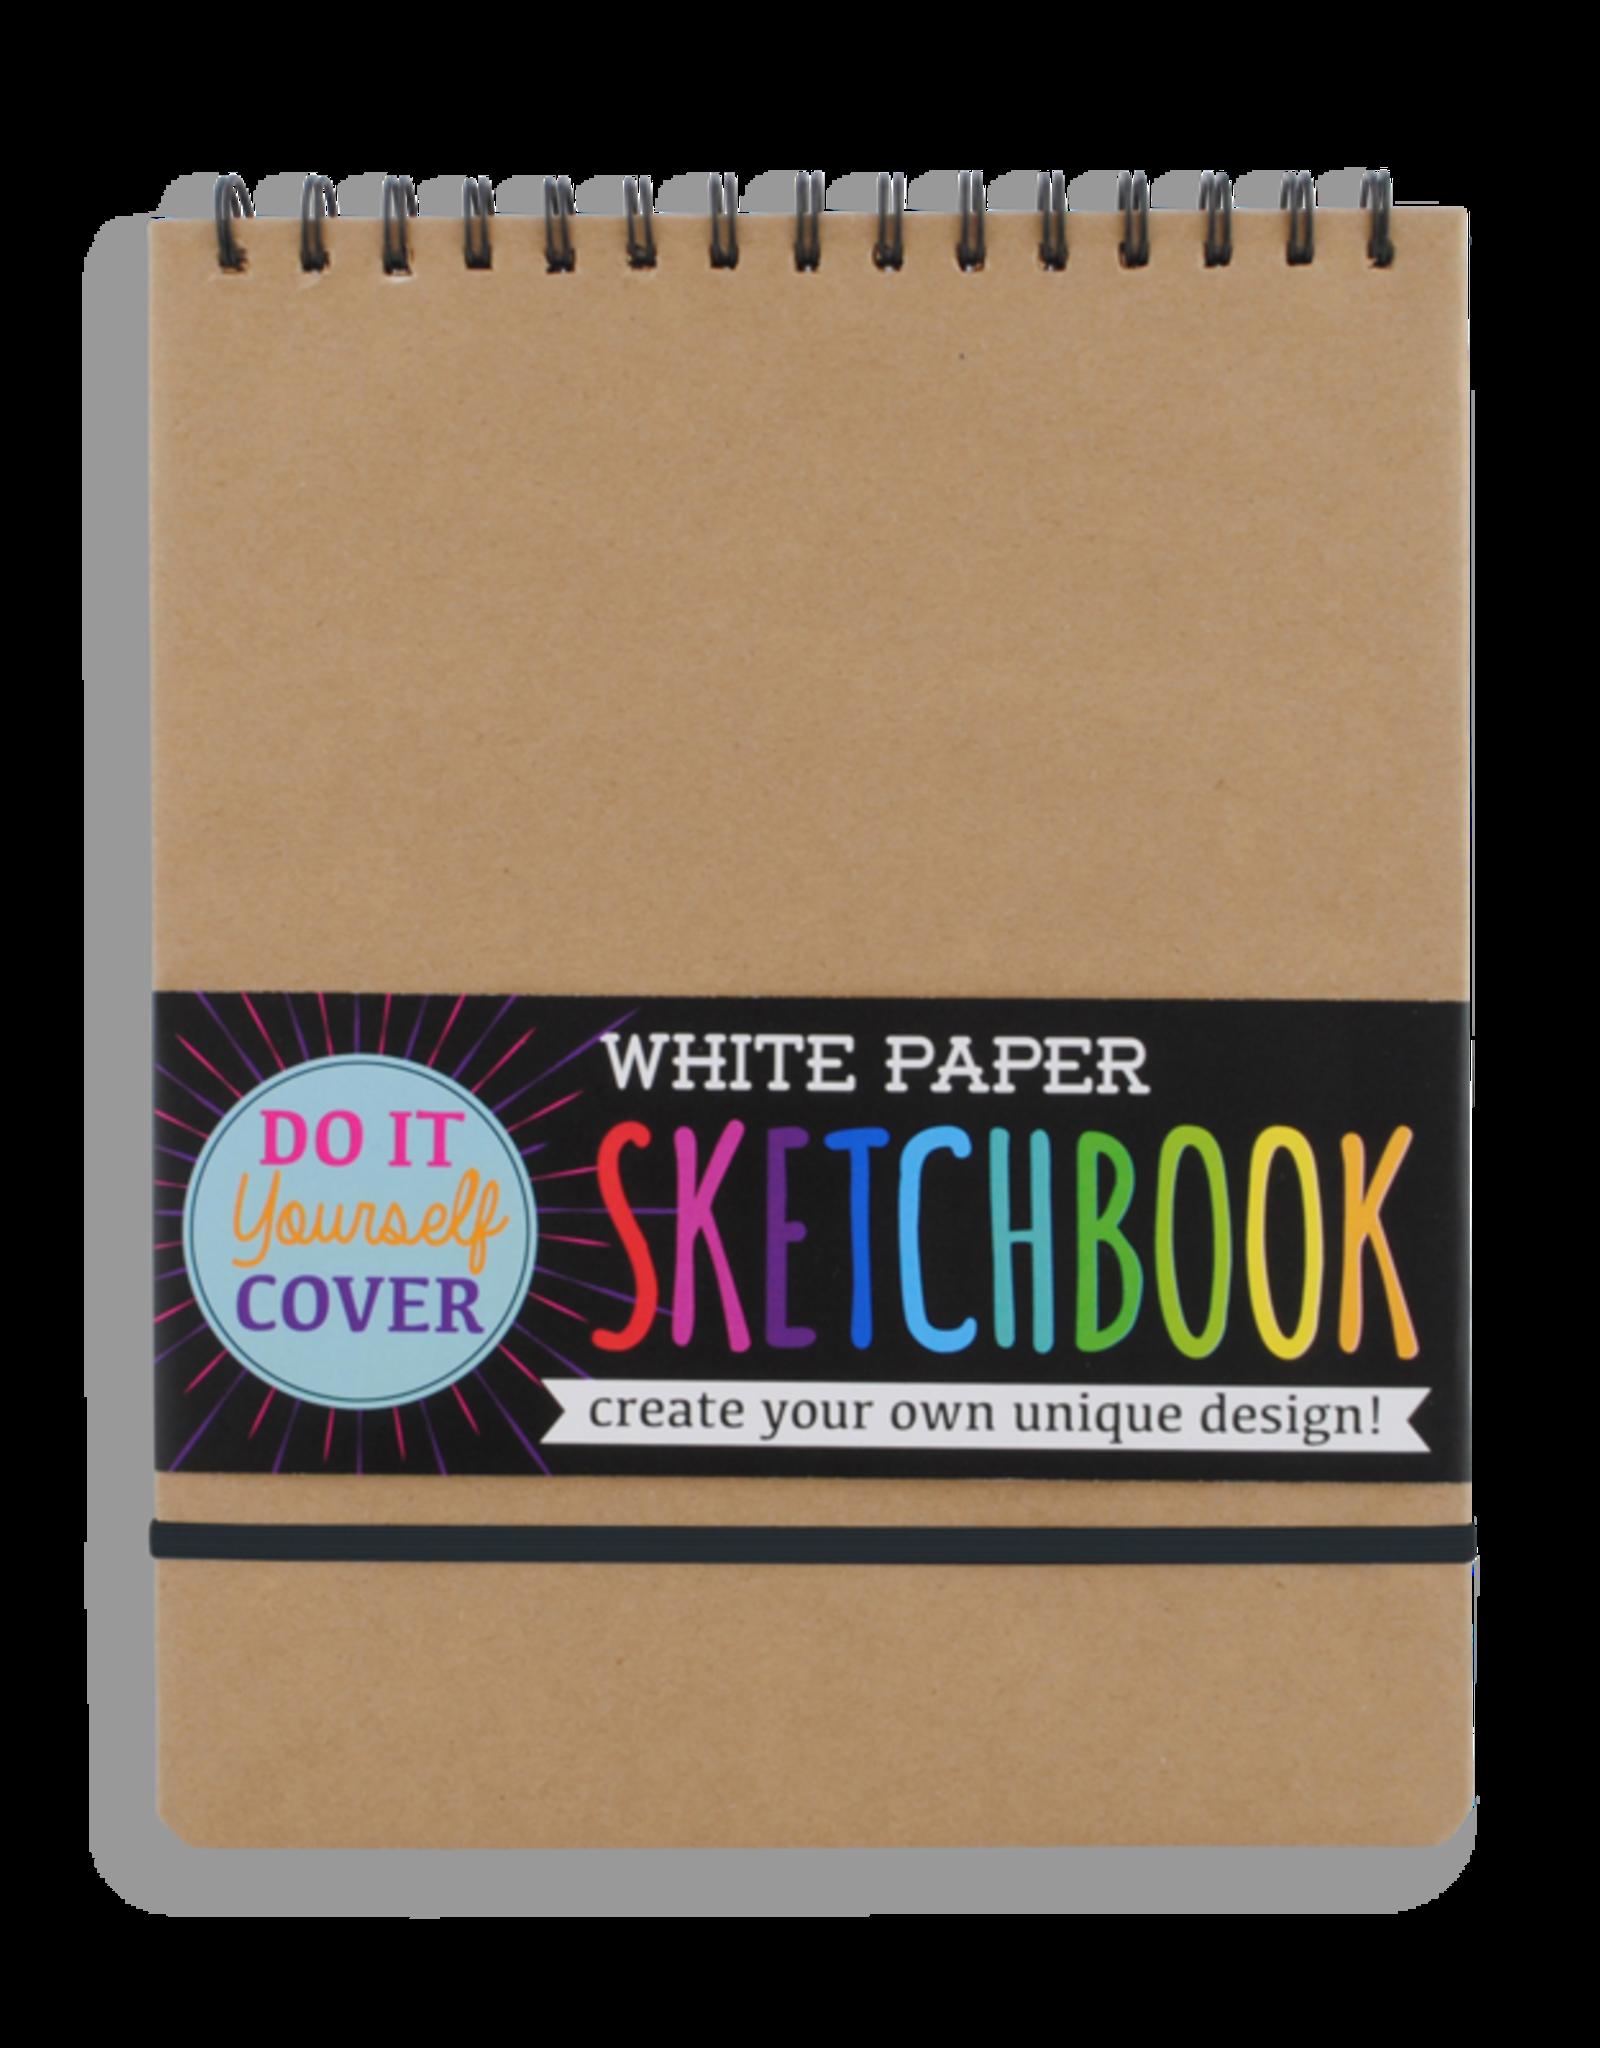 OOLY OOLY LARGE SKETCHBOOK WHITE PAPER